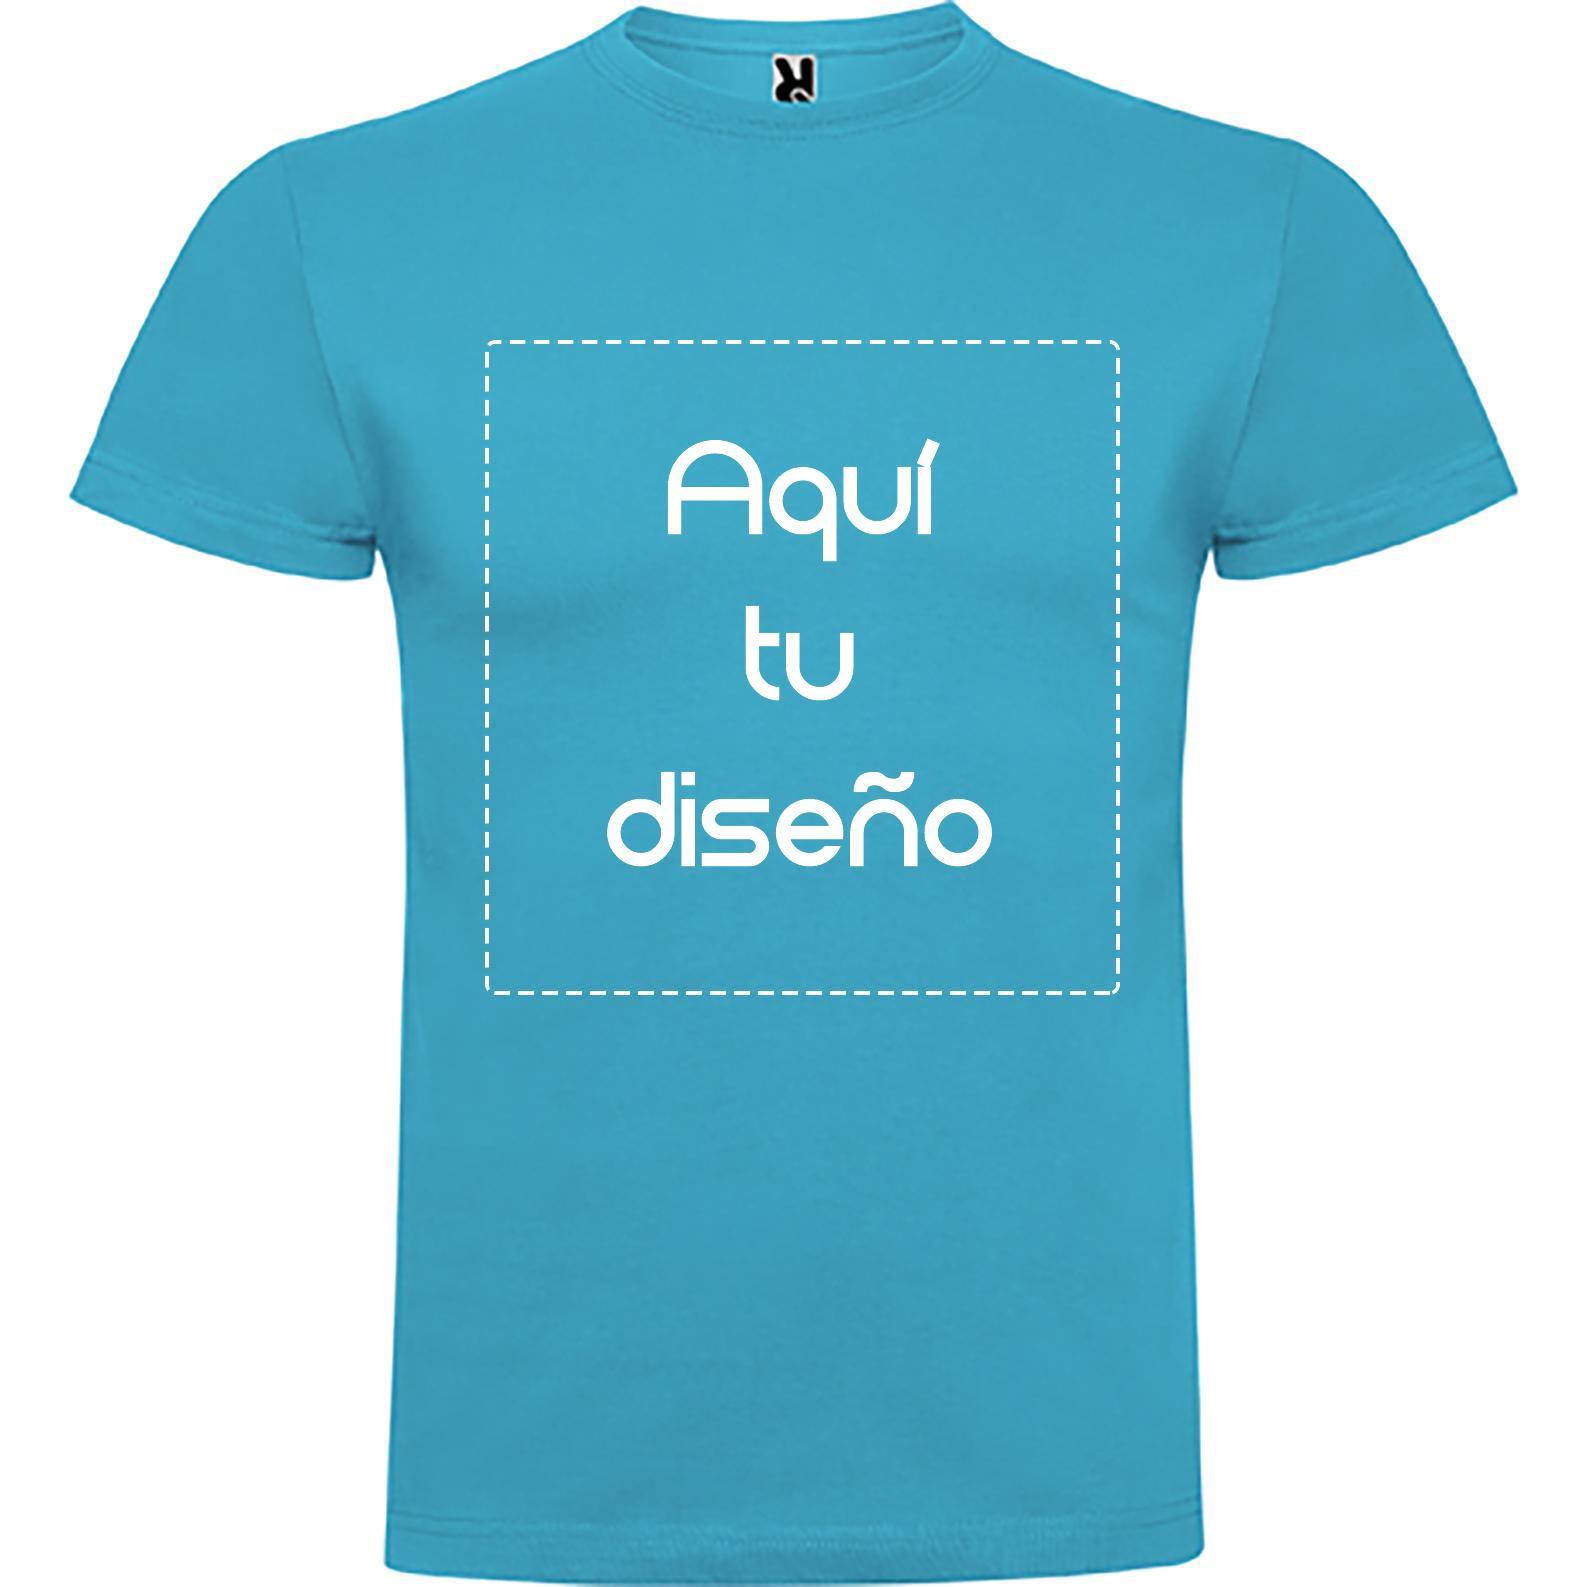 Camiseta azul turquesa